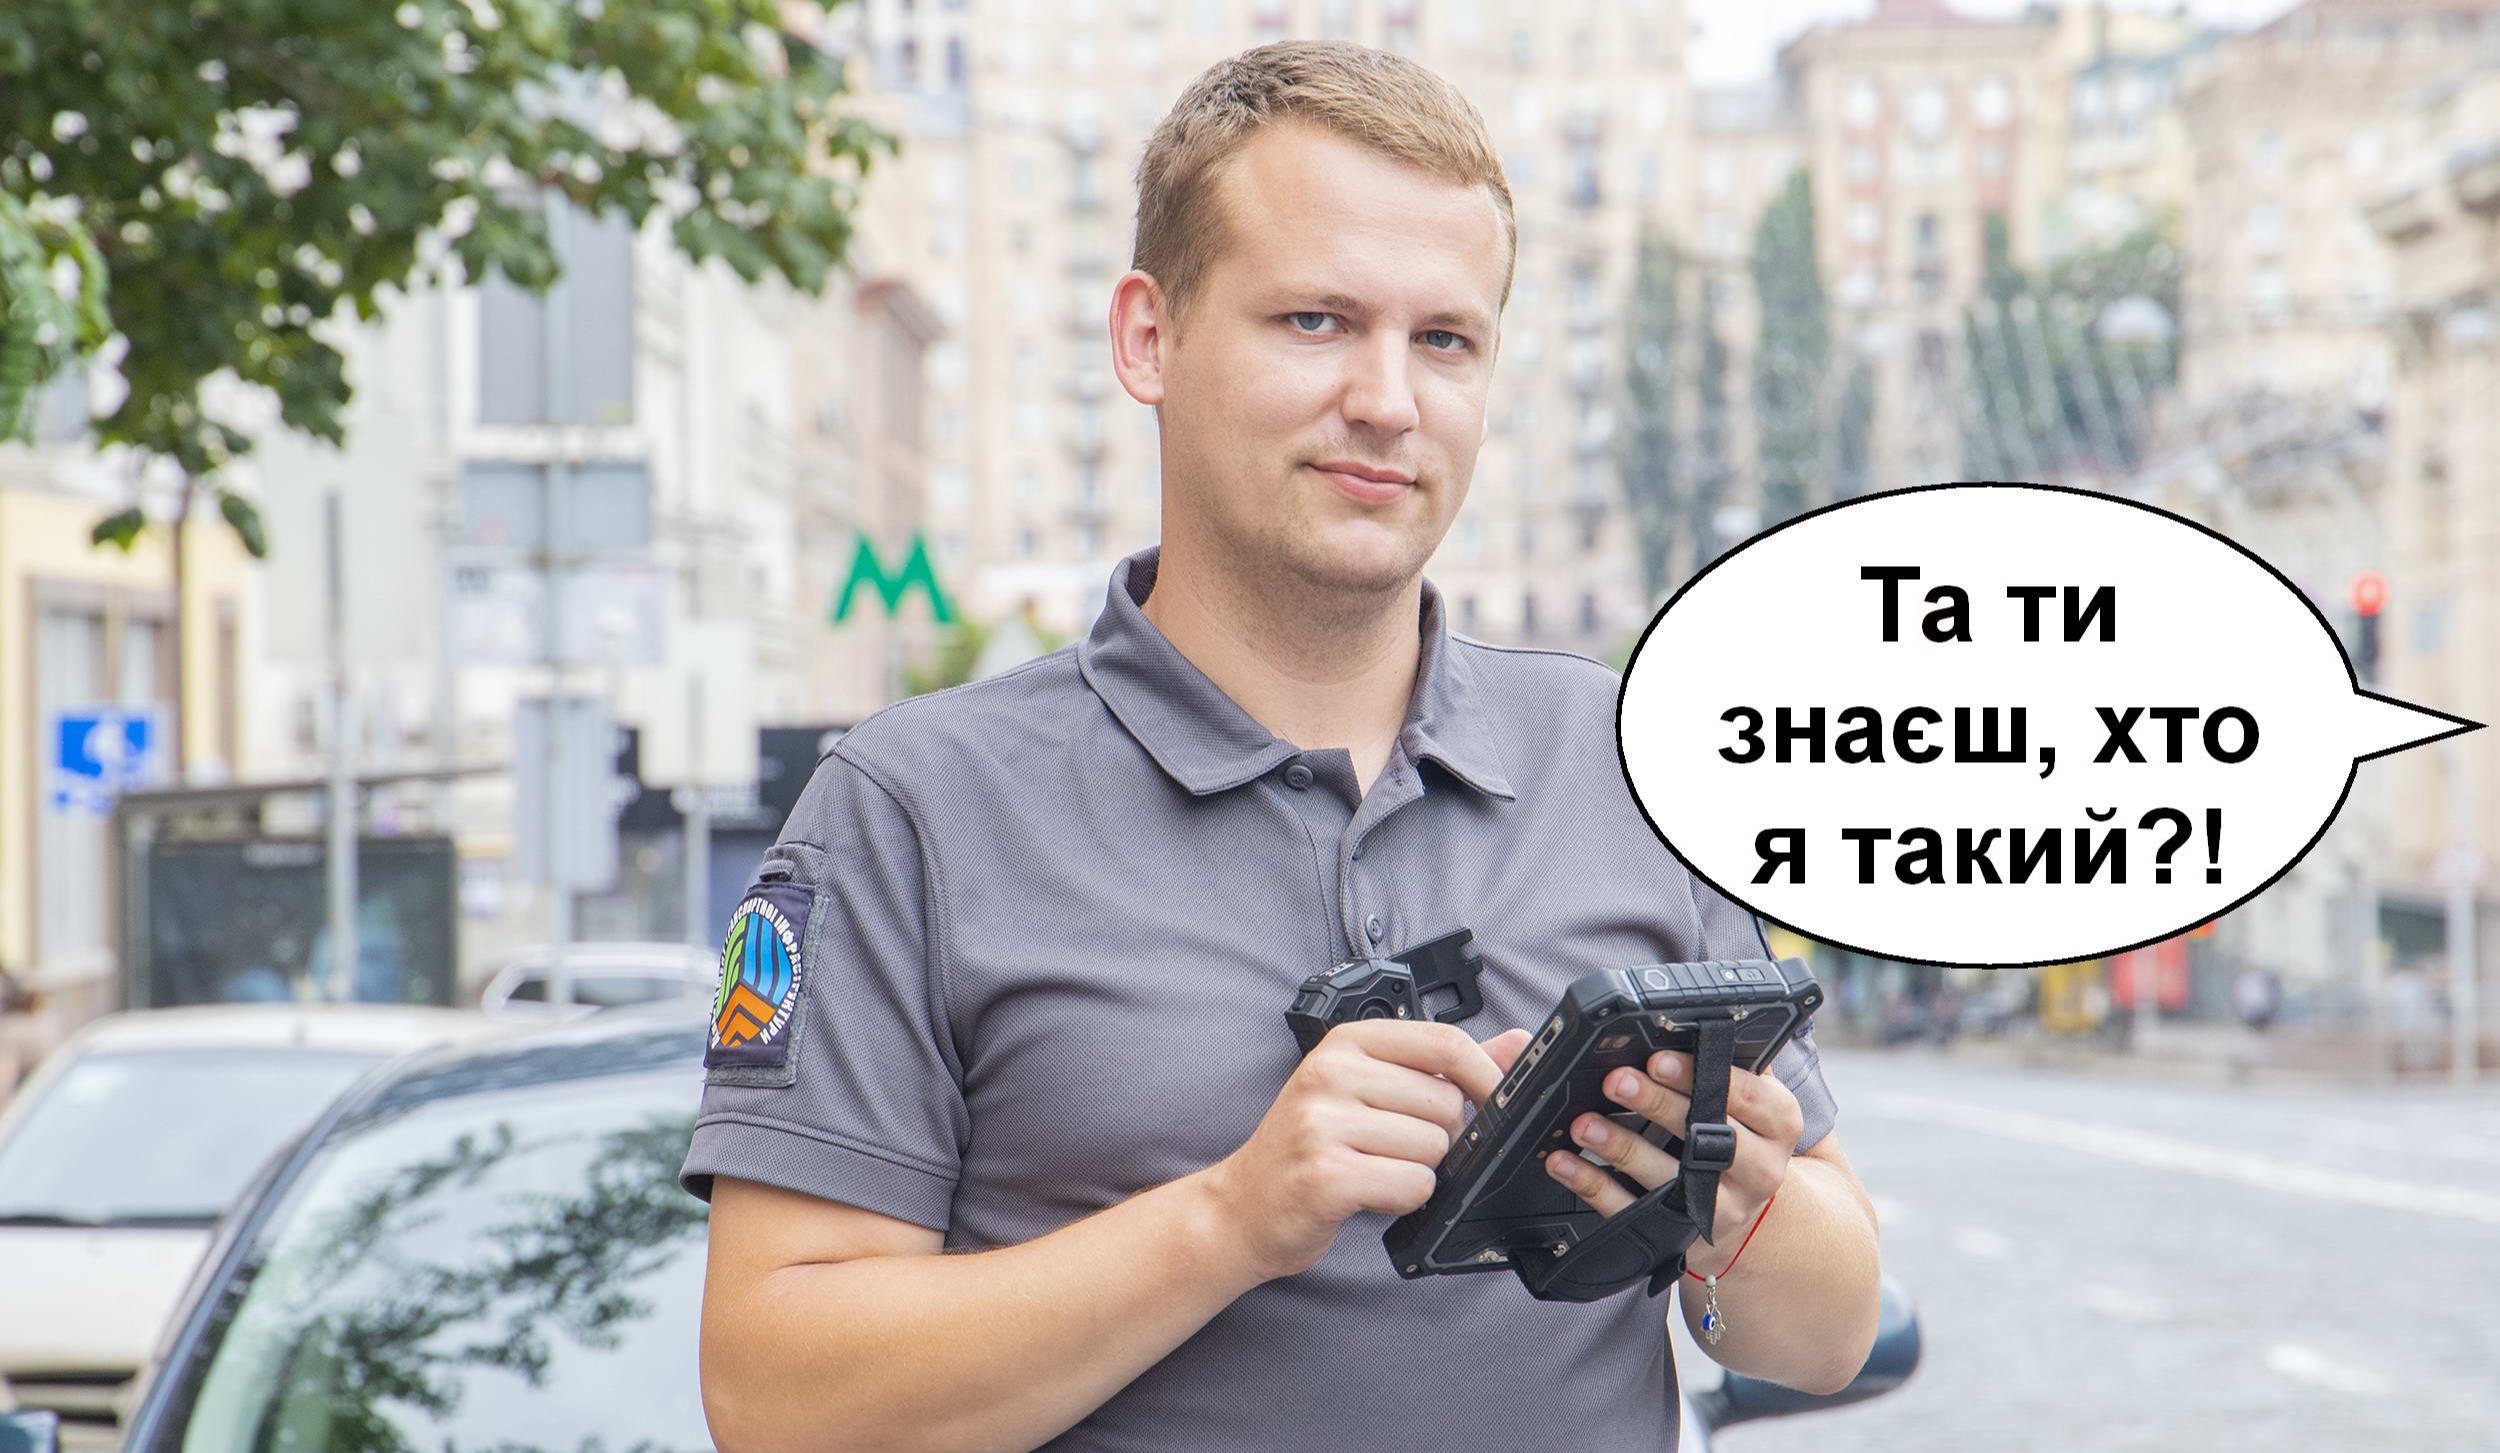 «Датызнаешь, кто ятакой?!»: топ-10 фраз отнарушителей парковки